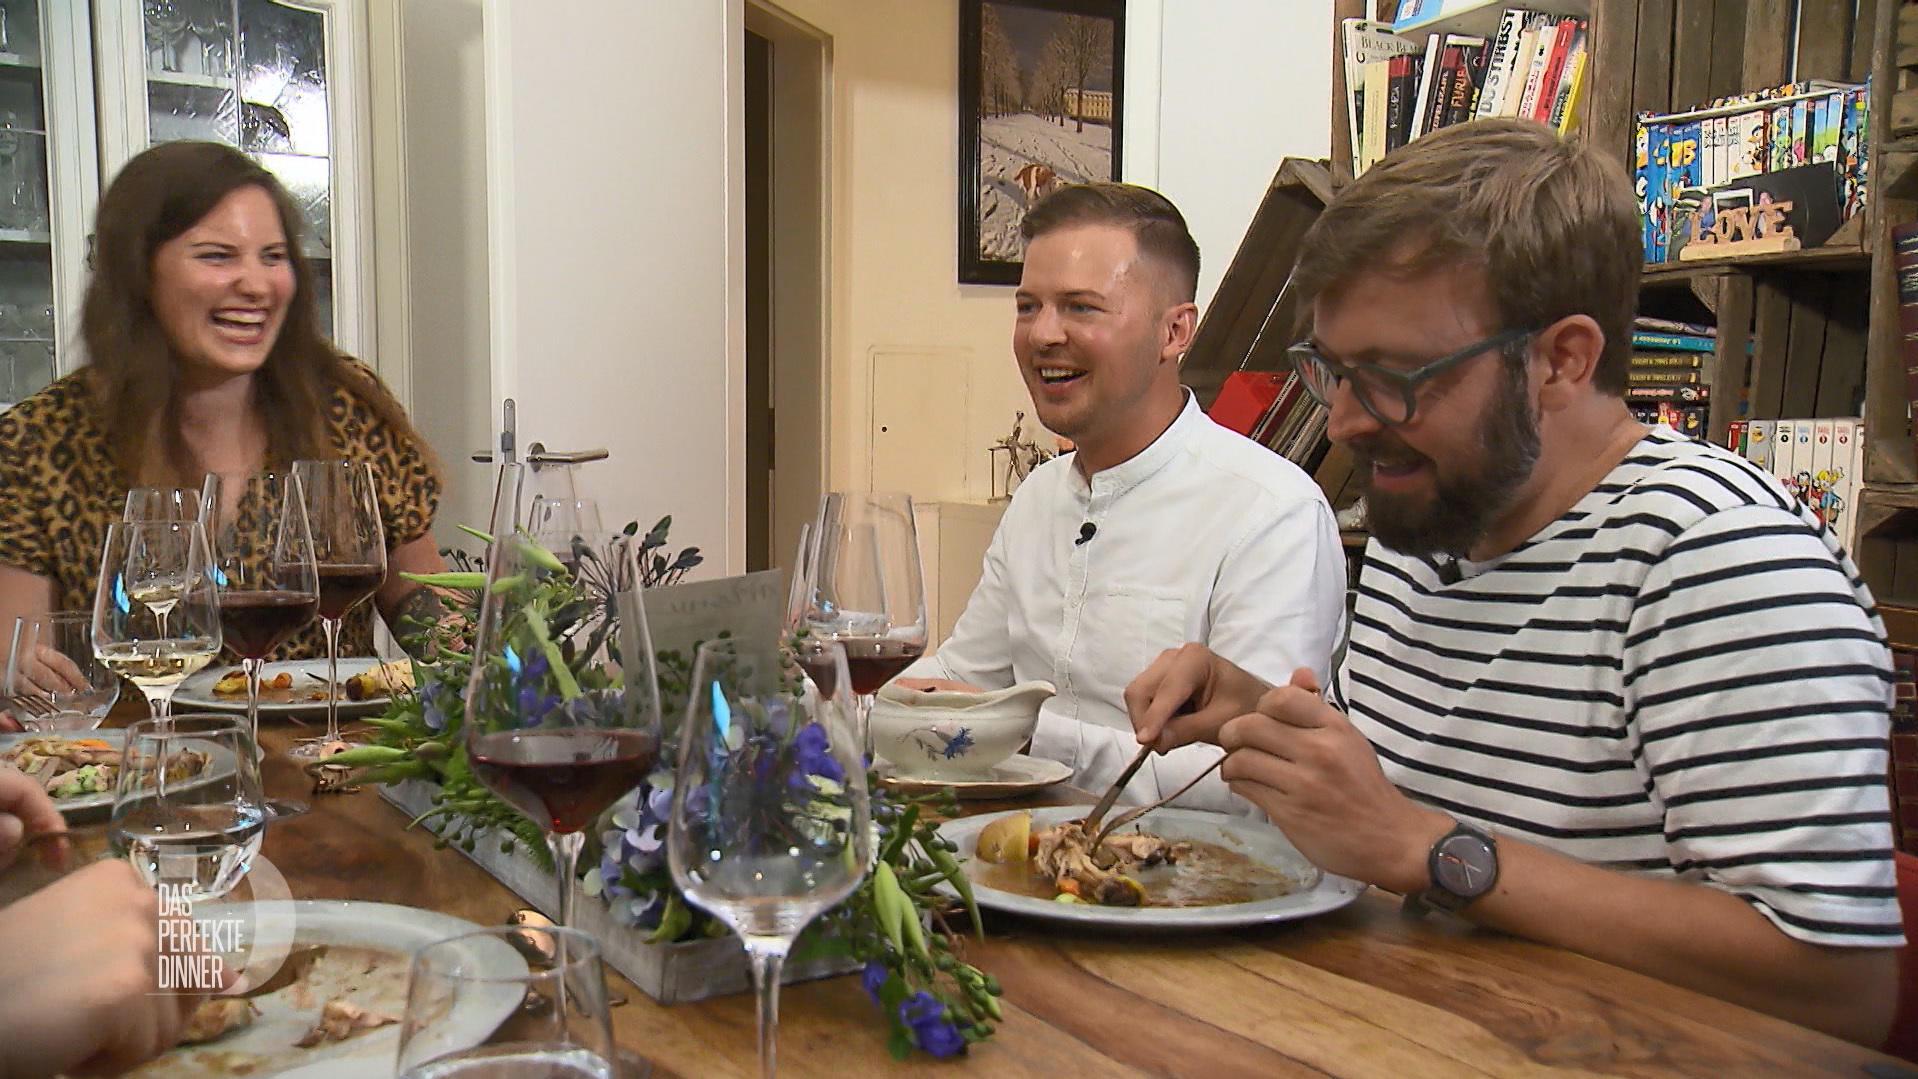 Vox Das Perfekte Profi Dinner